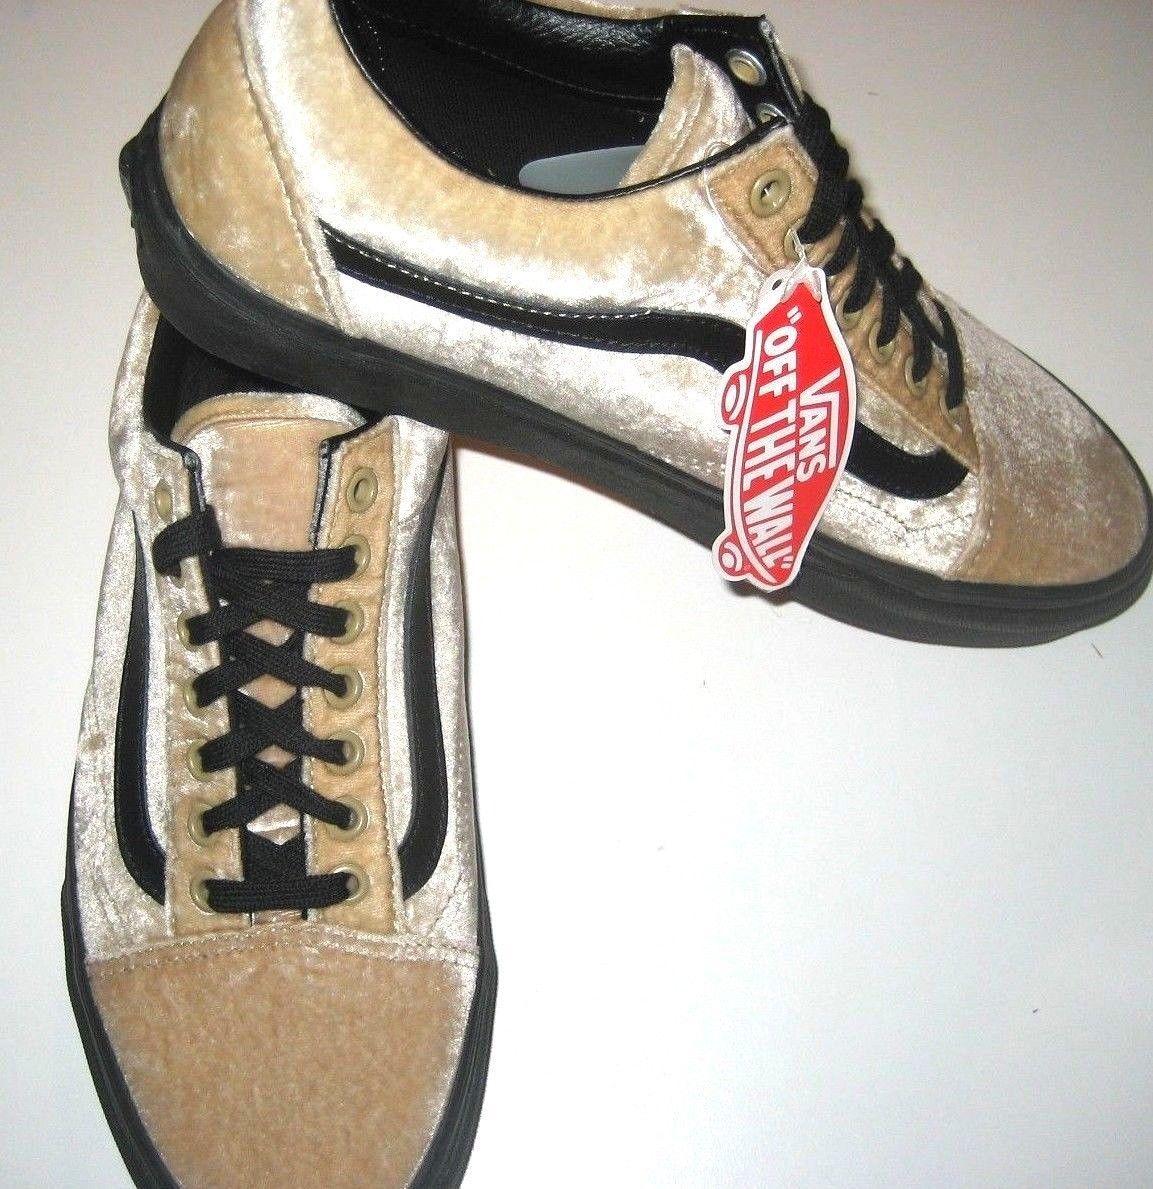 8184d0c6513aef Vans Mens Old Skool Velvet Tan Beige Black Skate Shoes size 9 NWT  VN0A38G1NQA